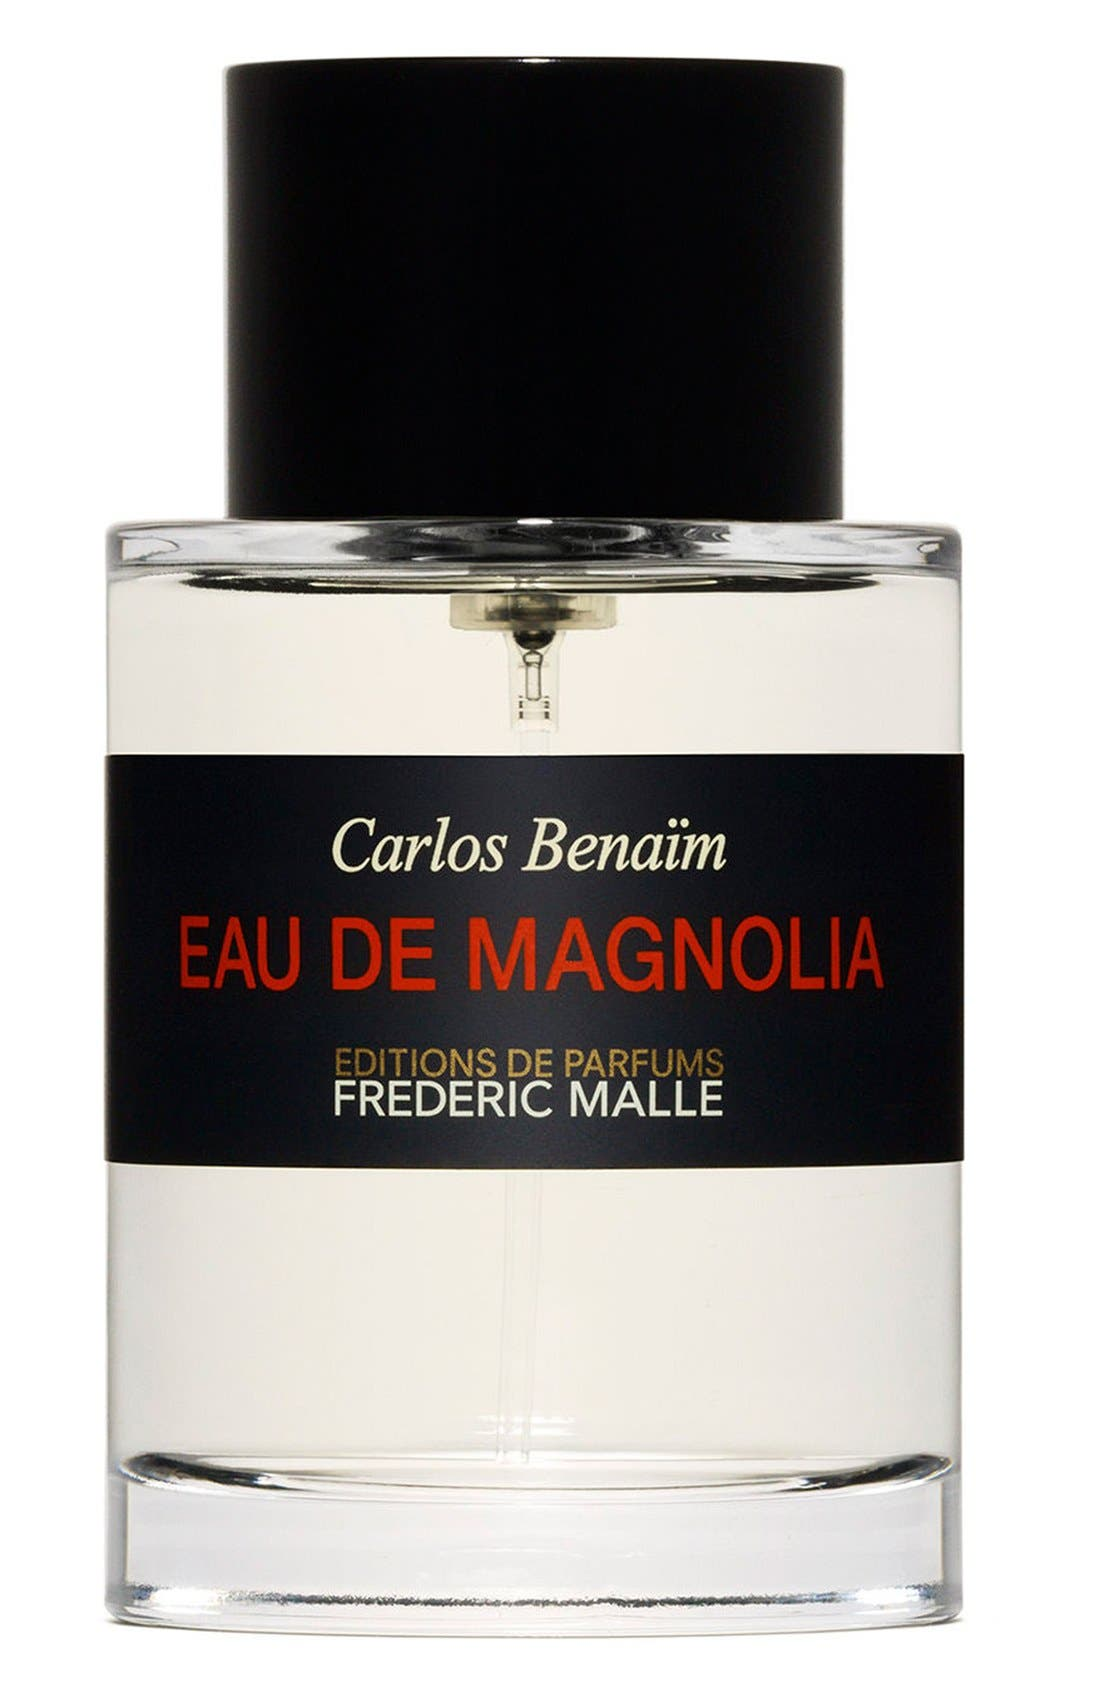 Editions de Parfums Frédéric Malle Eau de Magnolia Parfum Spray